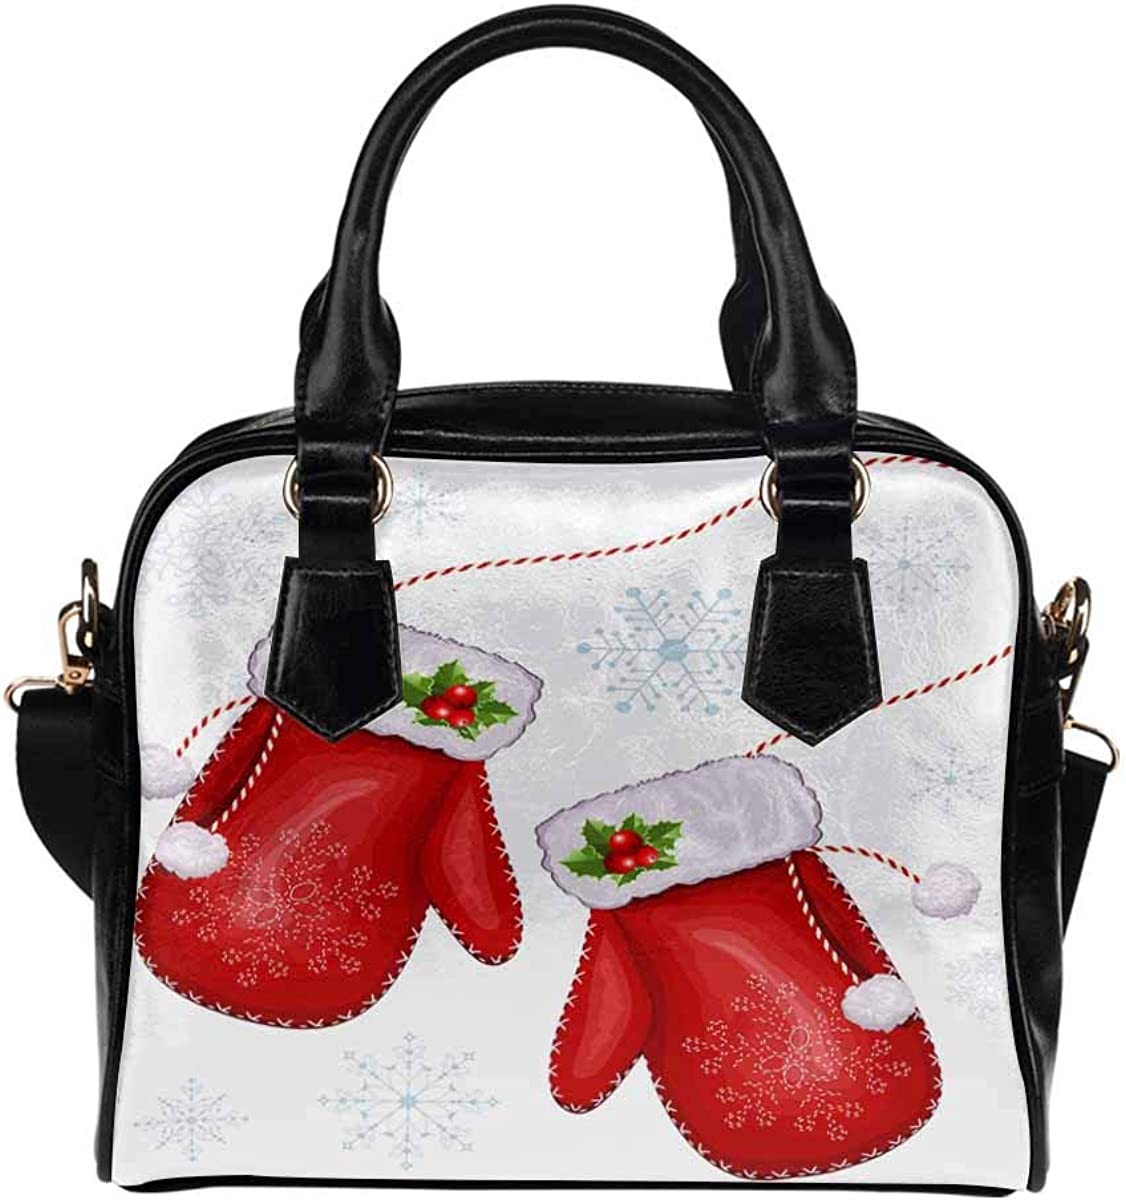 Christmas Santa Claus PU Leather Purse Handbags Shoulder Crossbody Bag for Women Girls